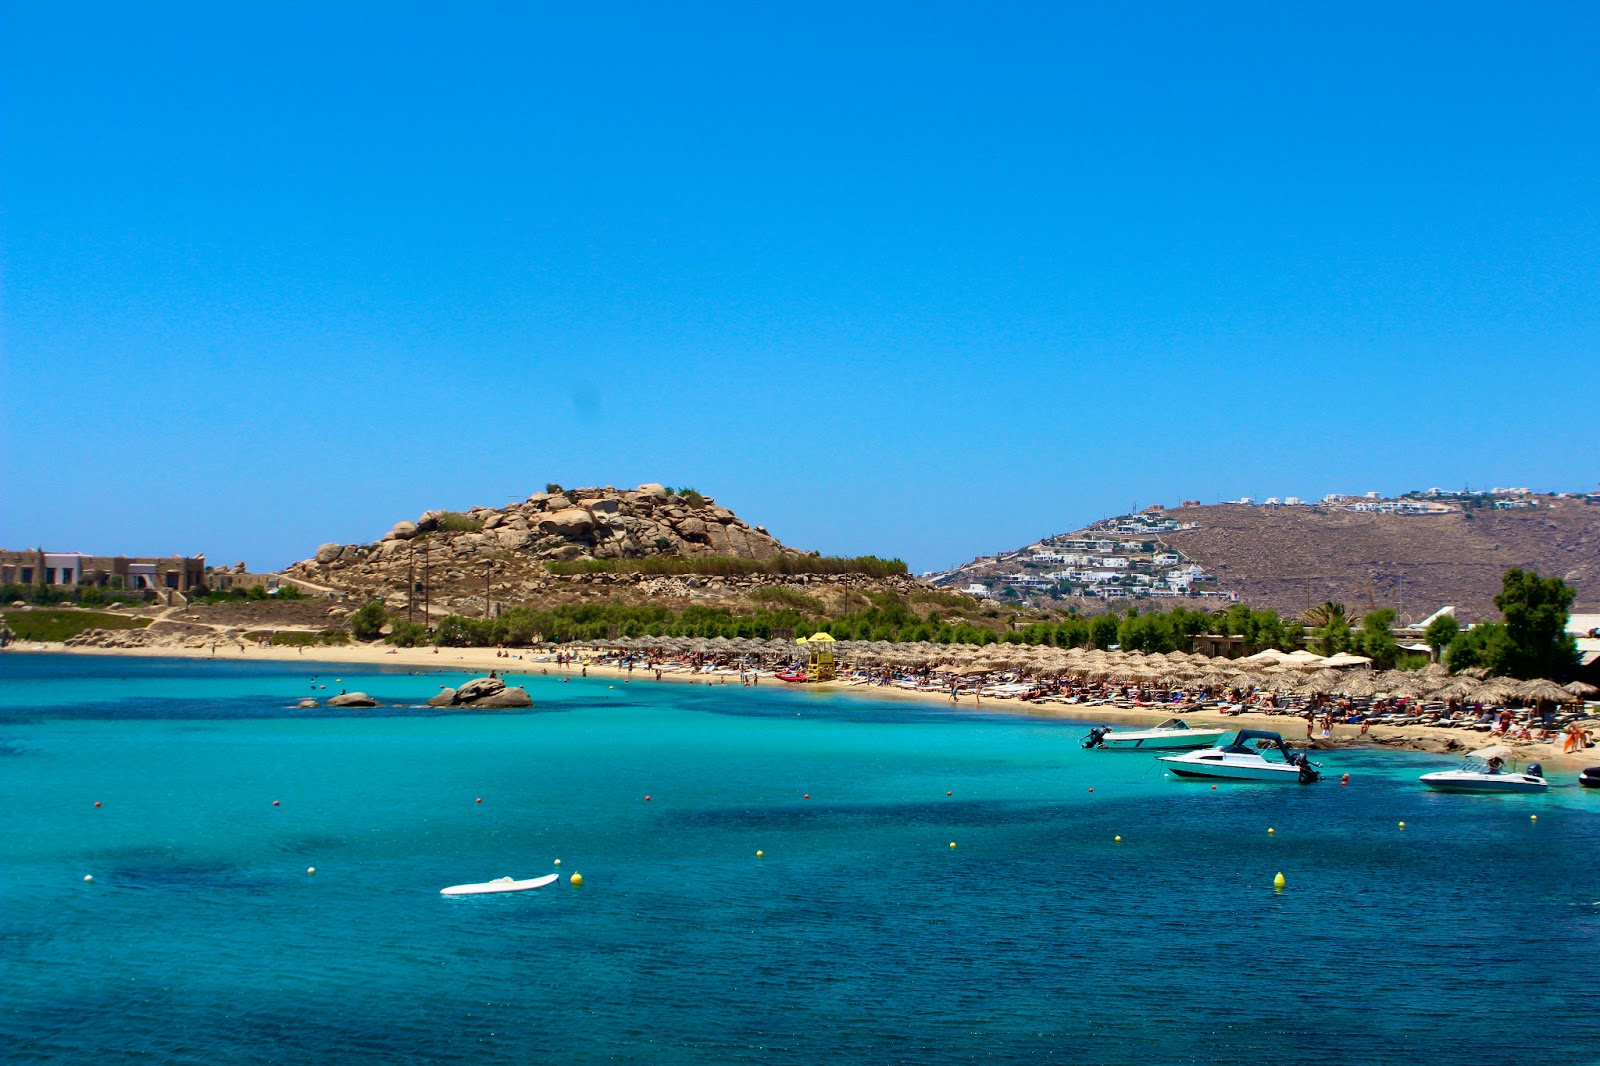 Best Island Beaches For Partying Mykonos St Barts: Nemo's Great Adventure: PSAROU BEACH & PARADISE BEACH